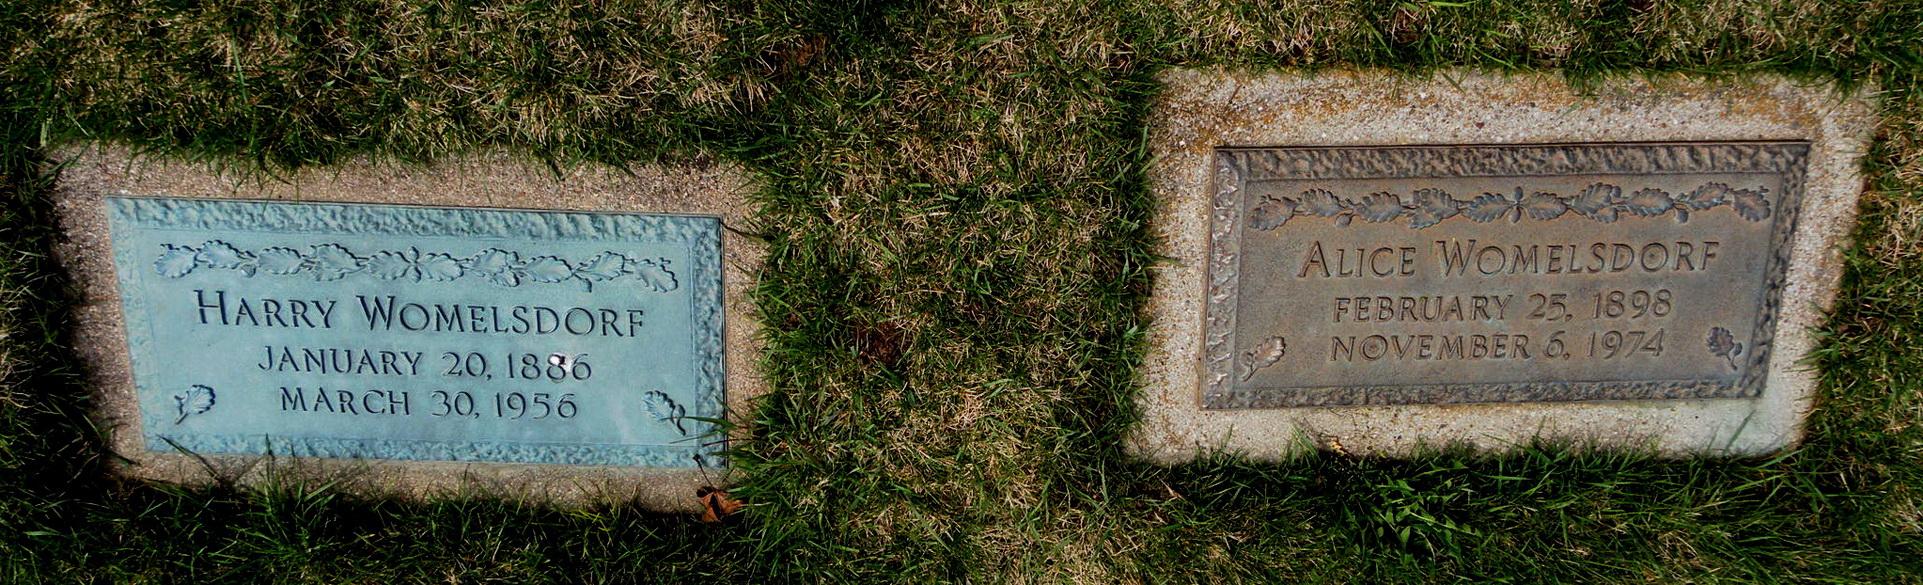 Harry Womelsdorf (1886-1956) - Find A Grave Memorial